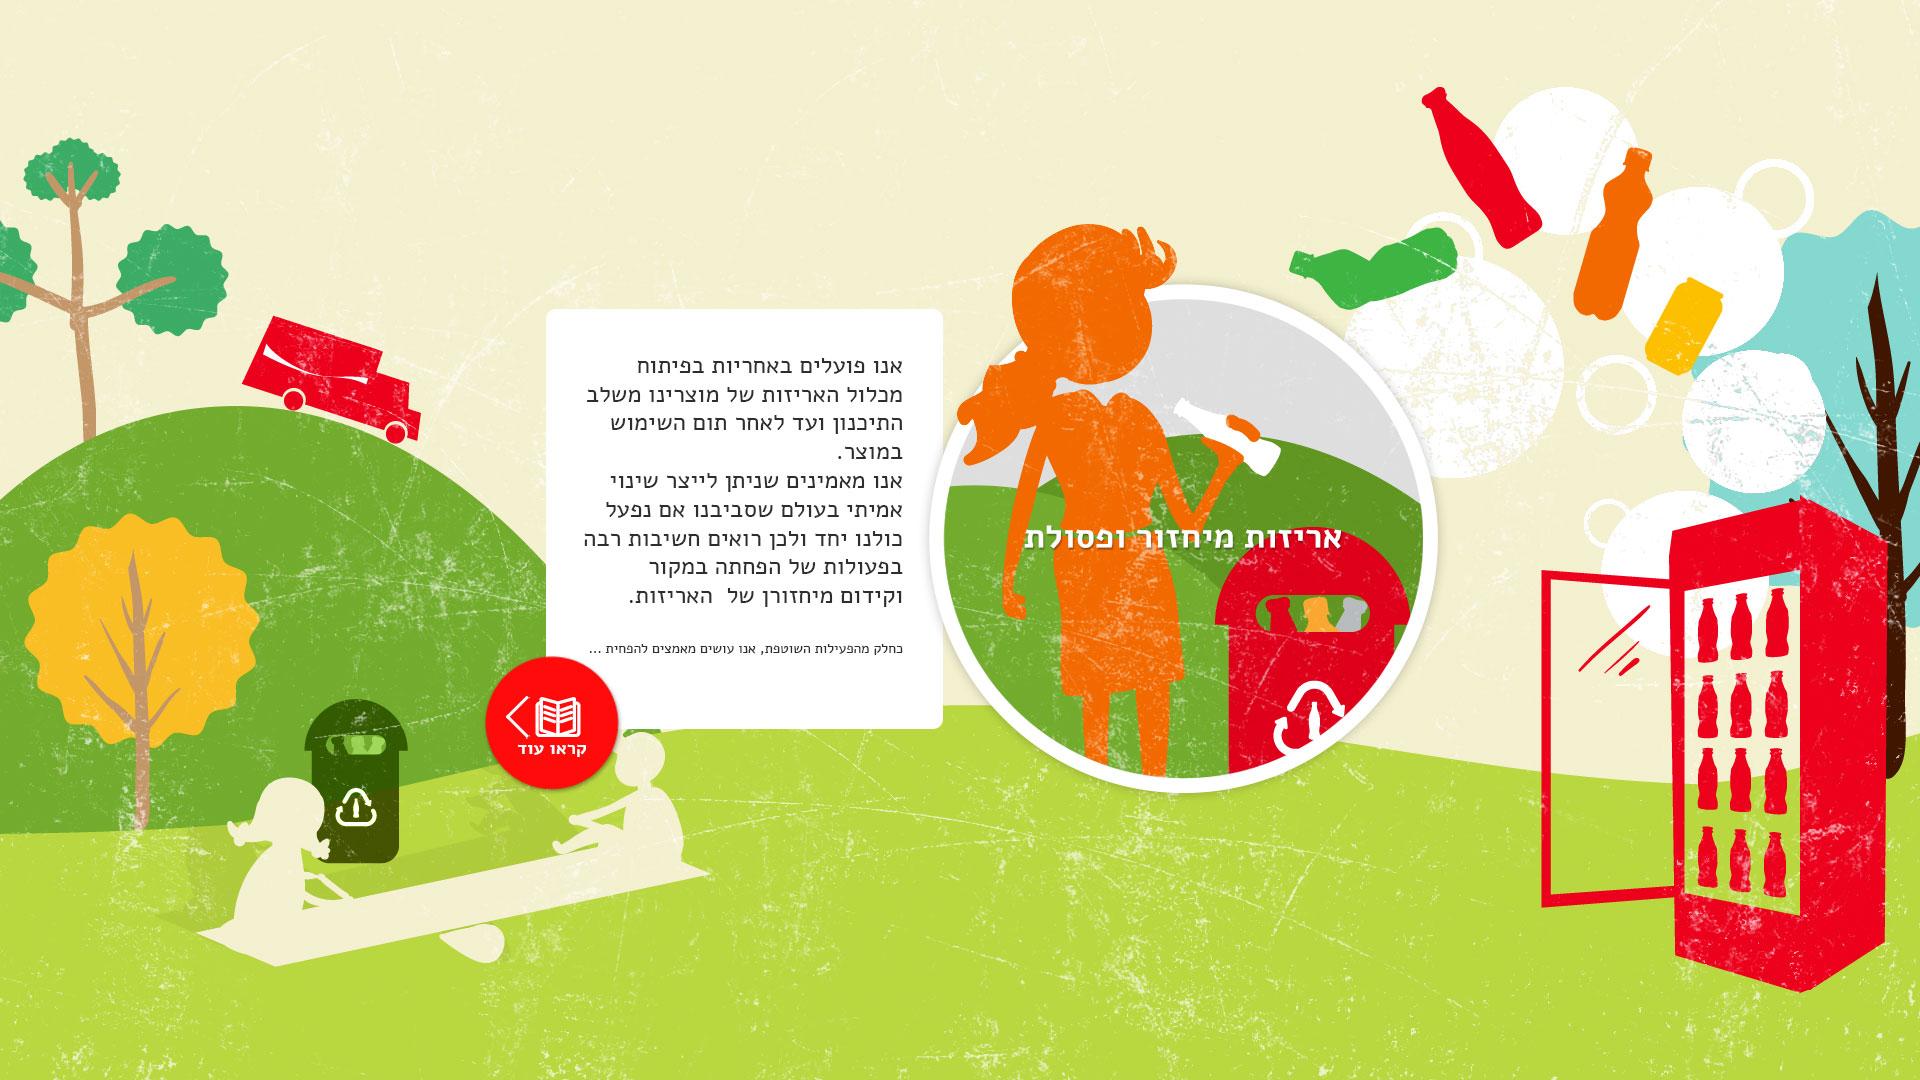 Coca Cola social responsibility website design קוקה קולה עיצוב אתר אחריות חברתית 4